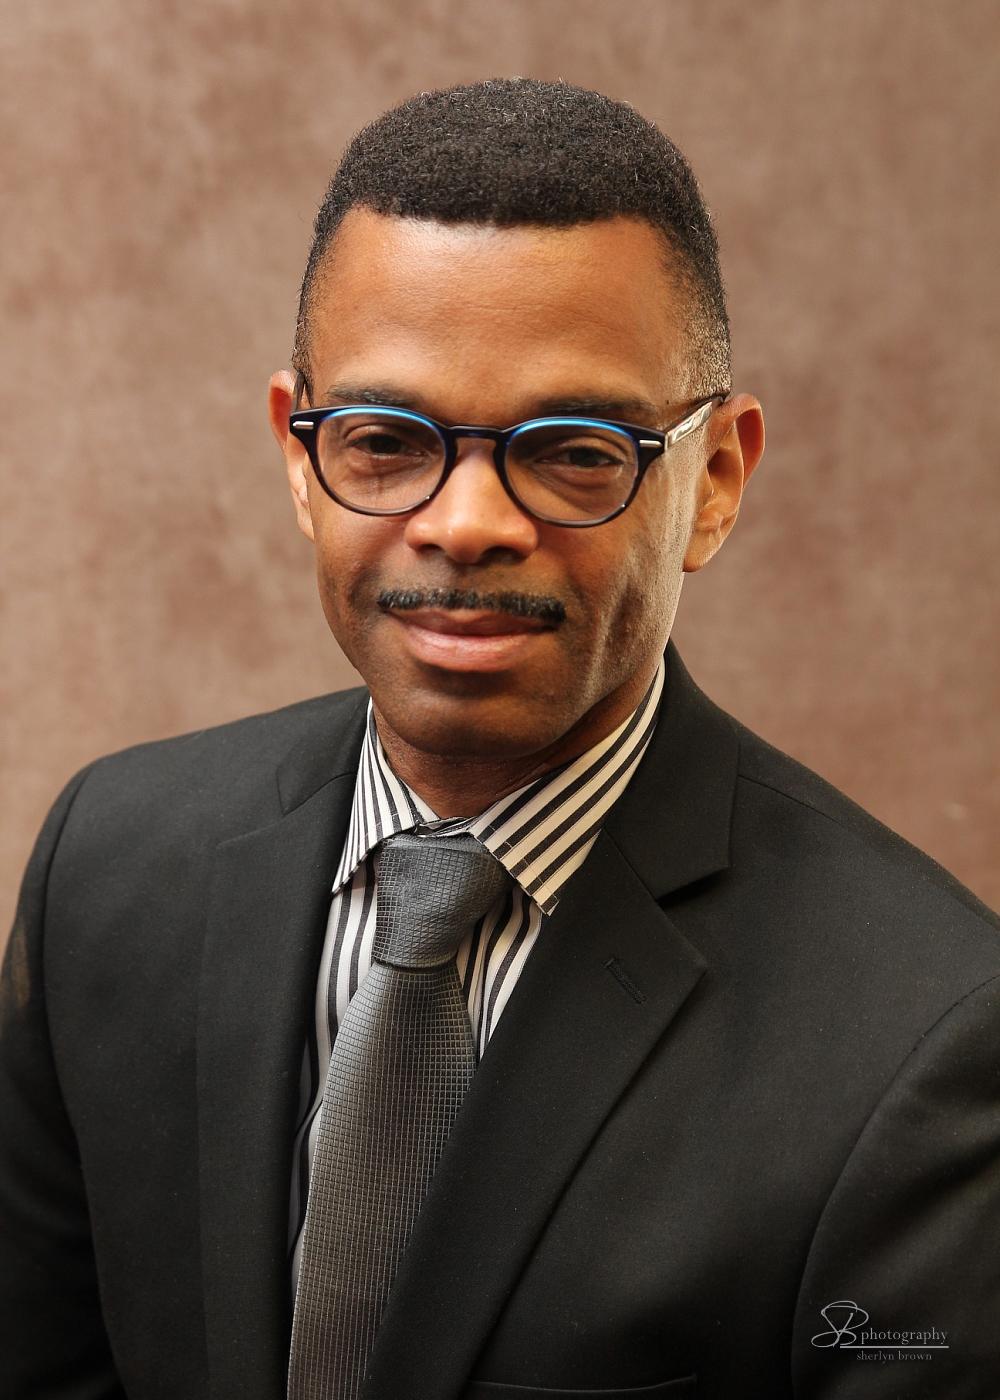 District Elder Jeffery L. Smith, 2nd Assistant Chair   Christ Temple Apostolic Church